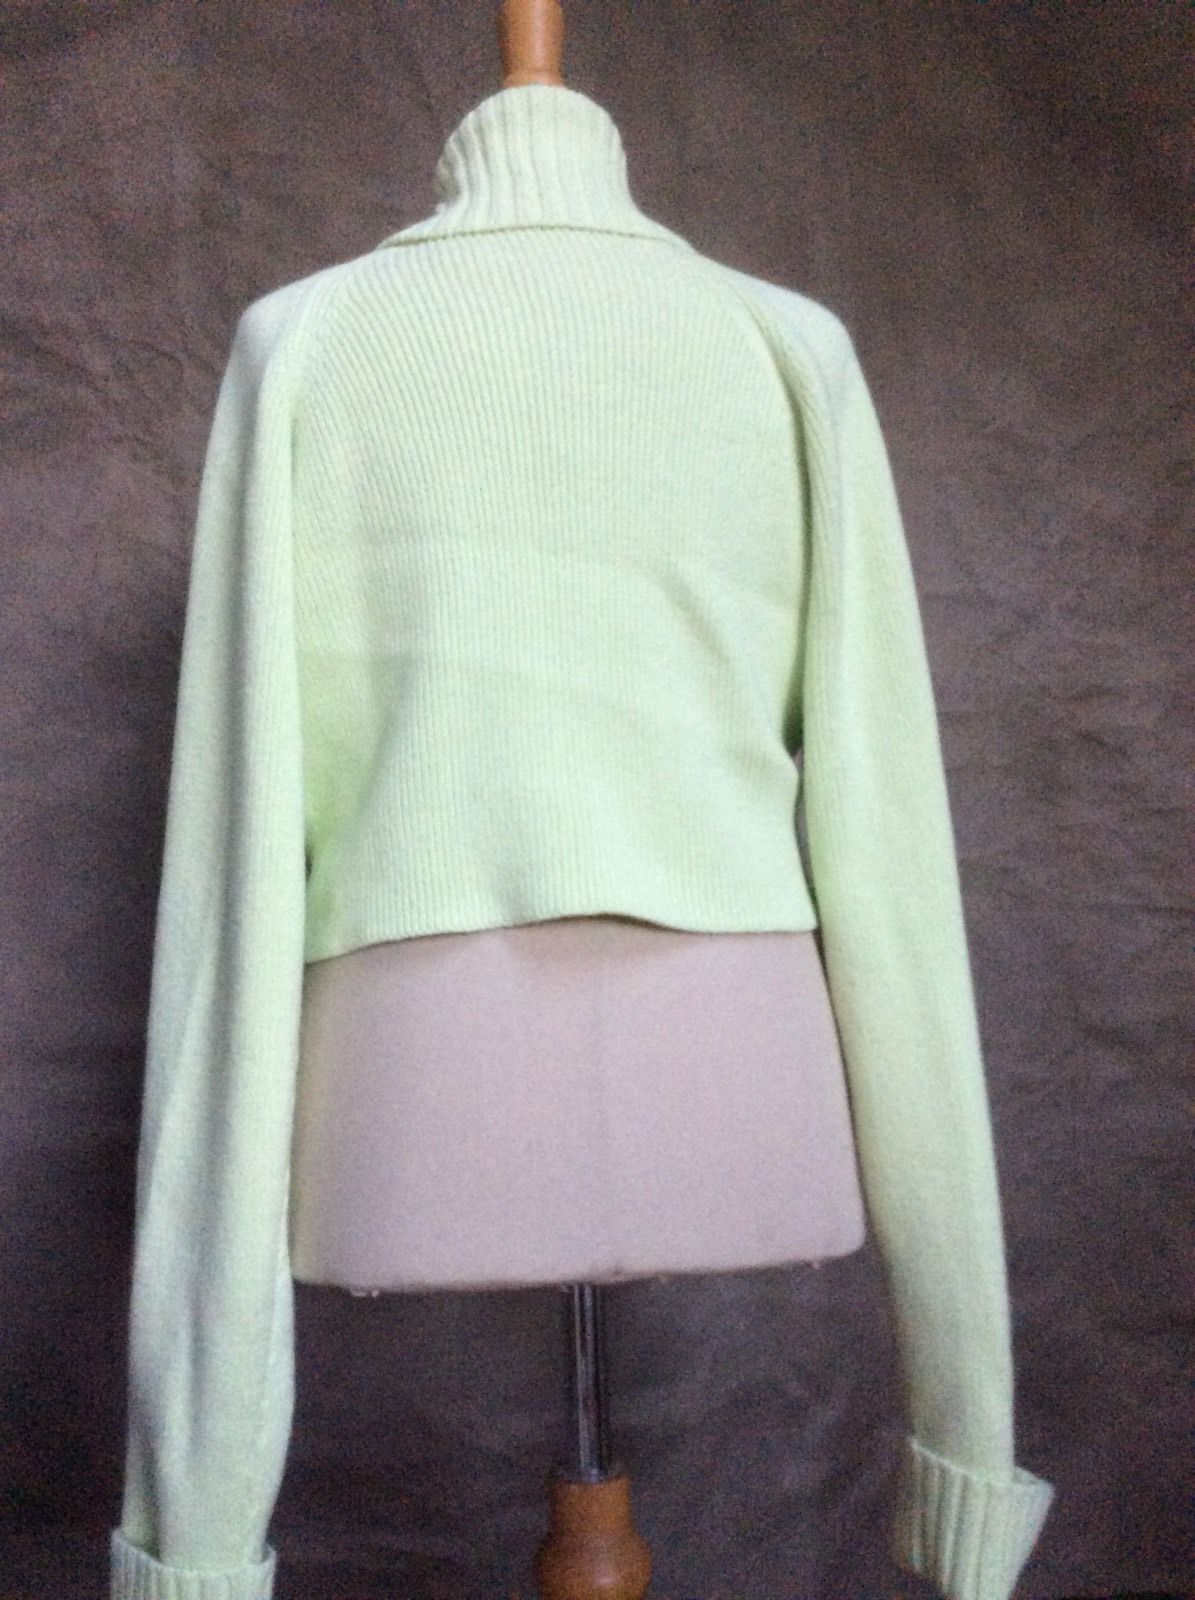 00a80a4d8fb Girls SHRUG SWEATER Cardigan Pink Light Green CORSAGE 12 GYMBOREE PETIT FOUR